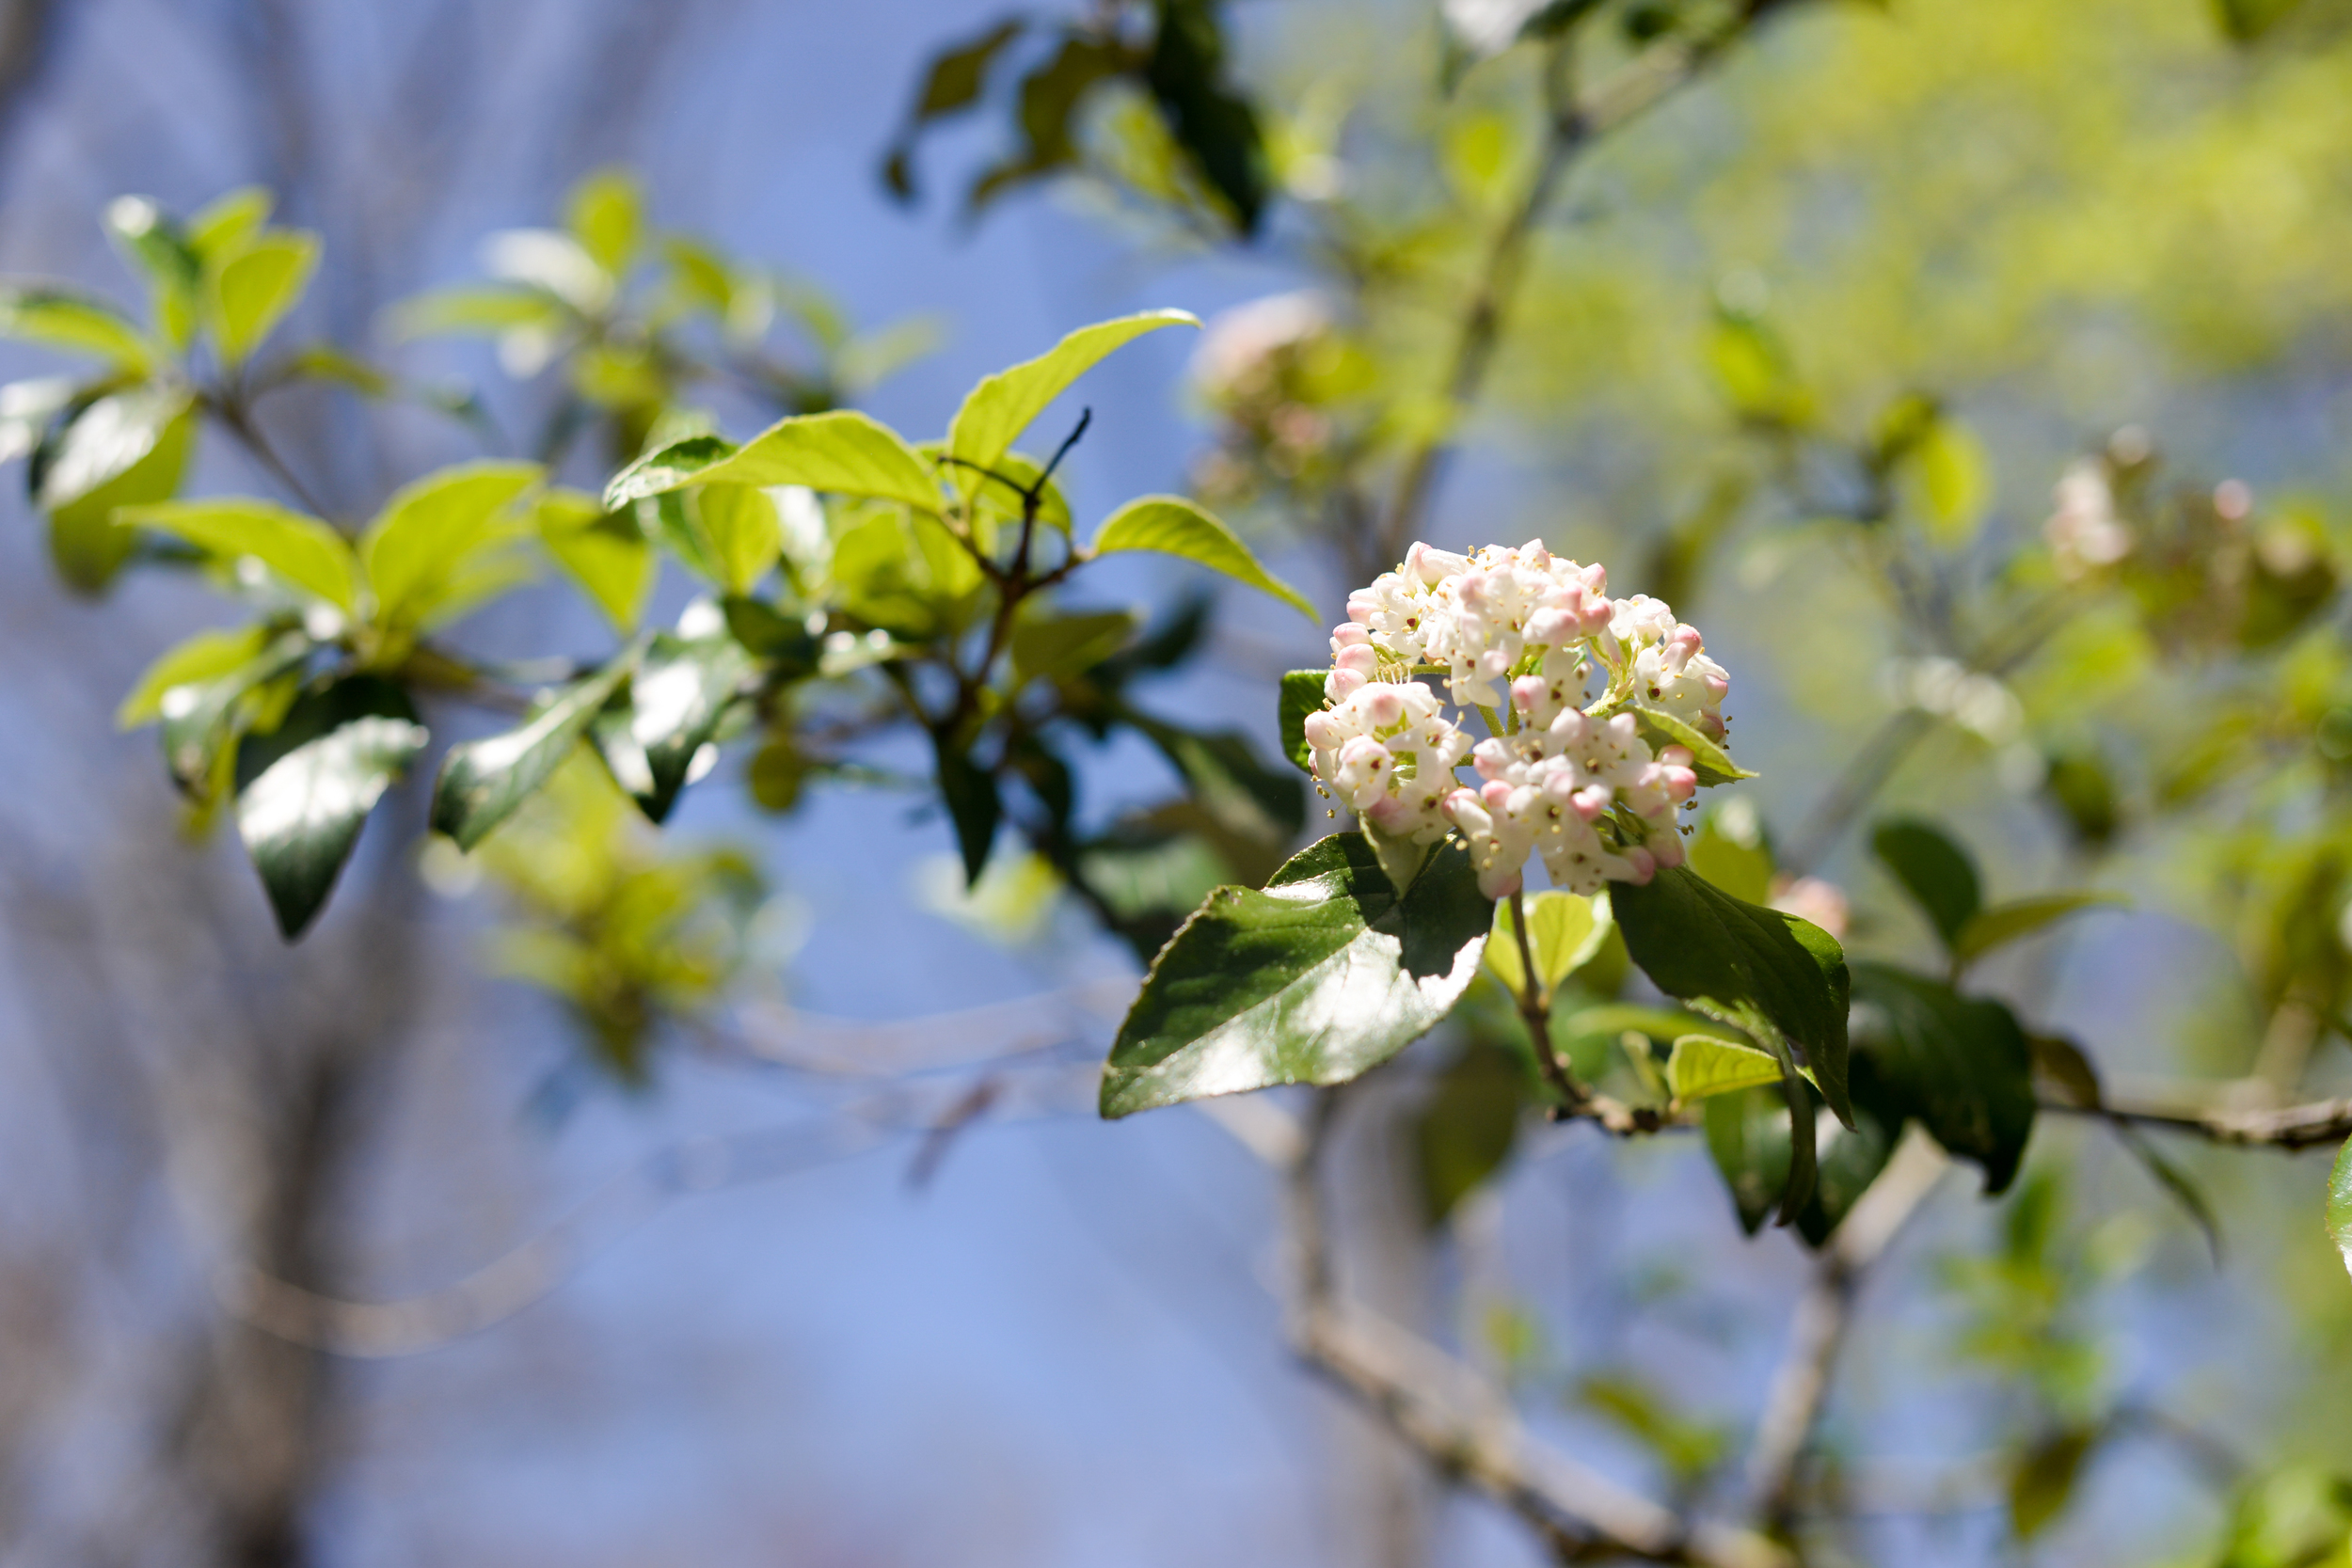 150404_hkp_botanicalgardens016.jpg